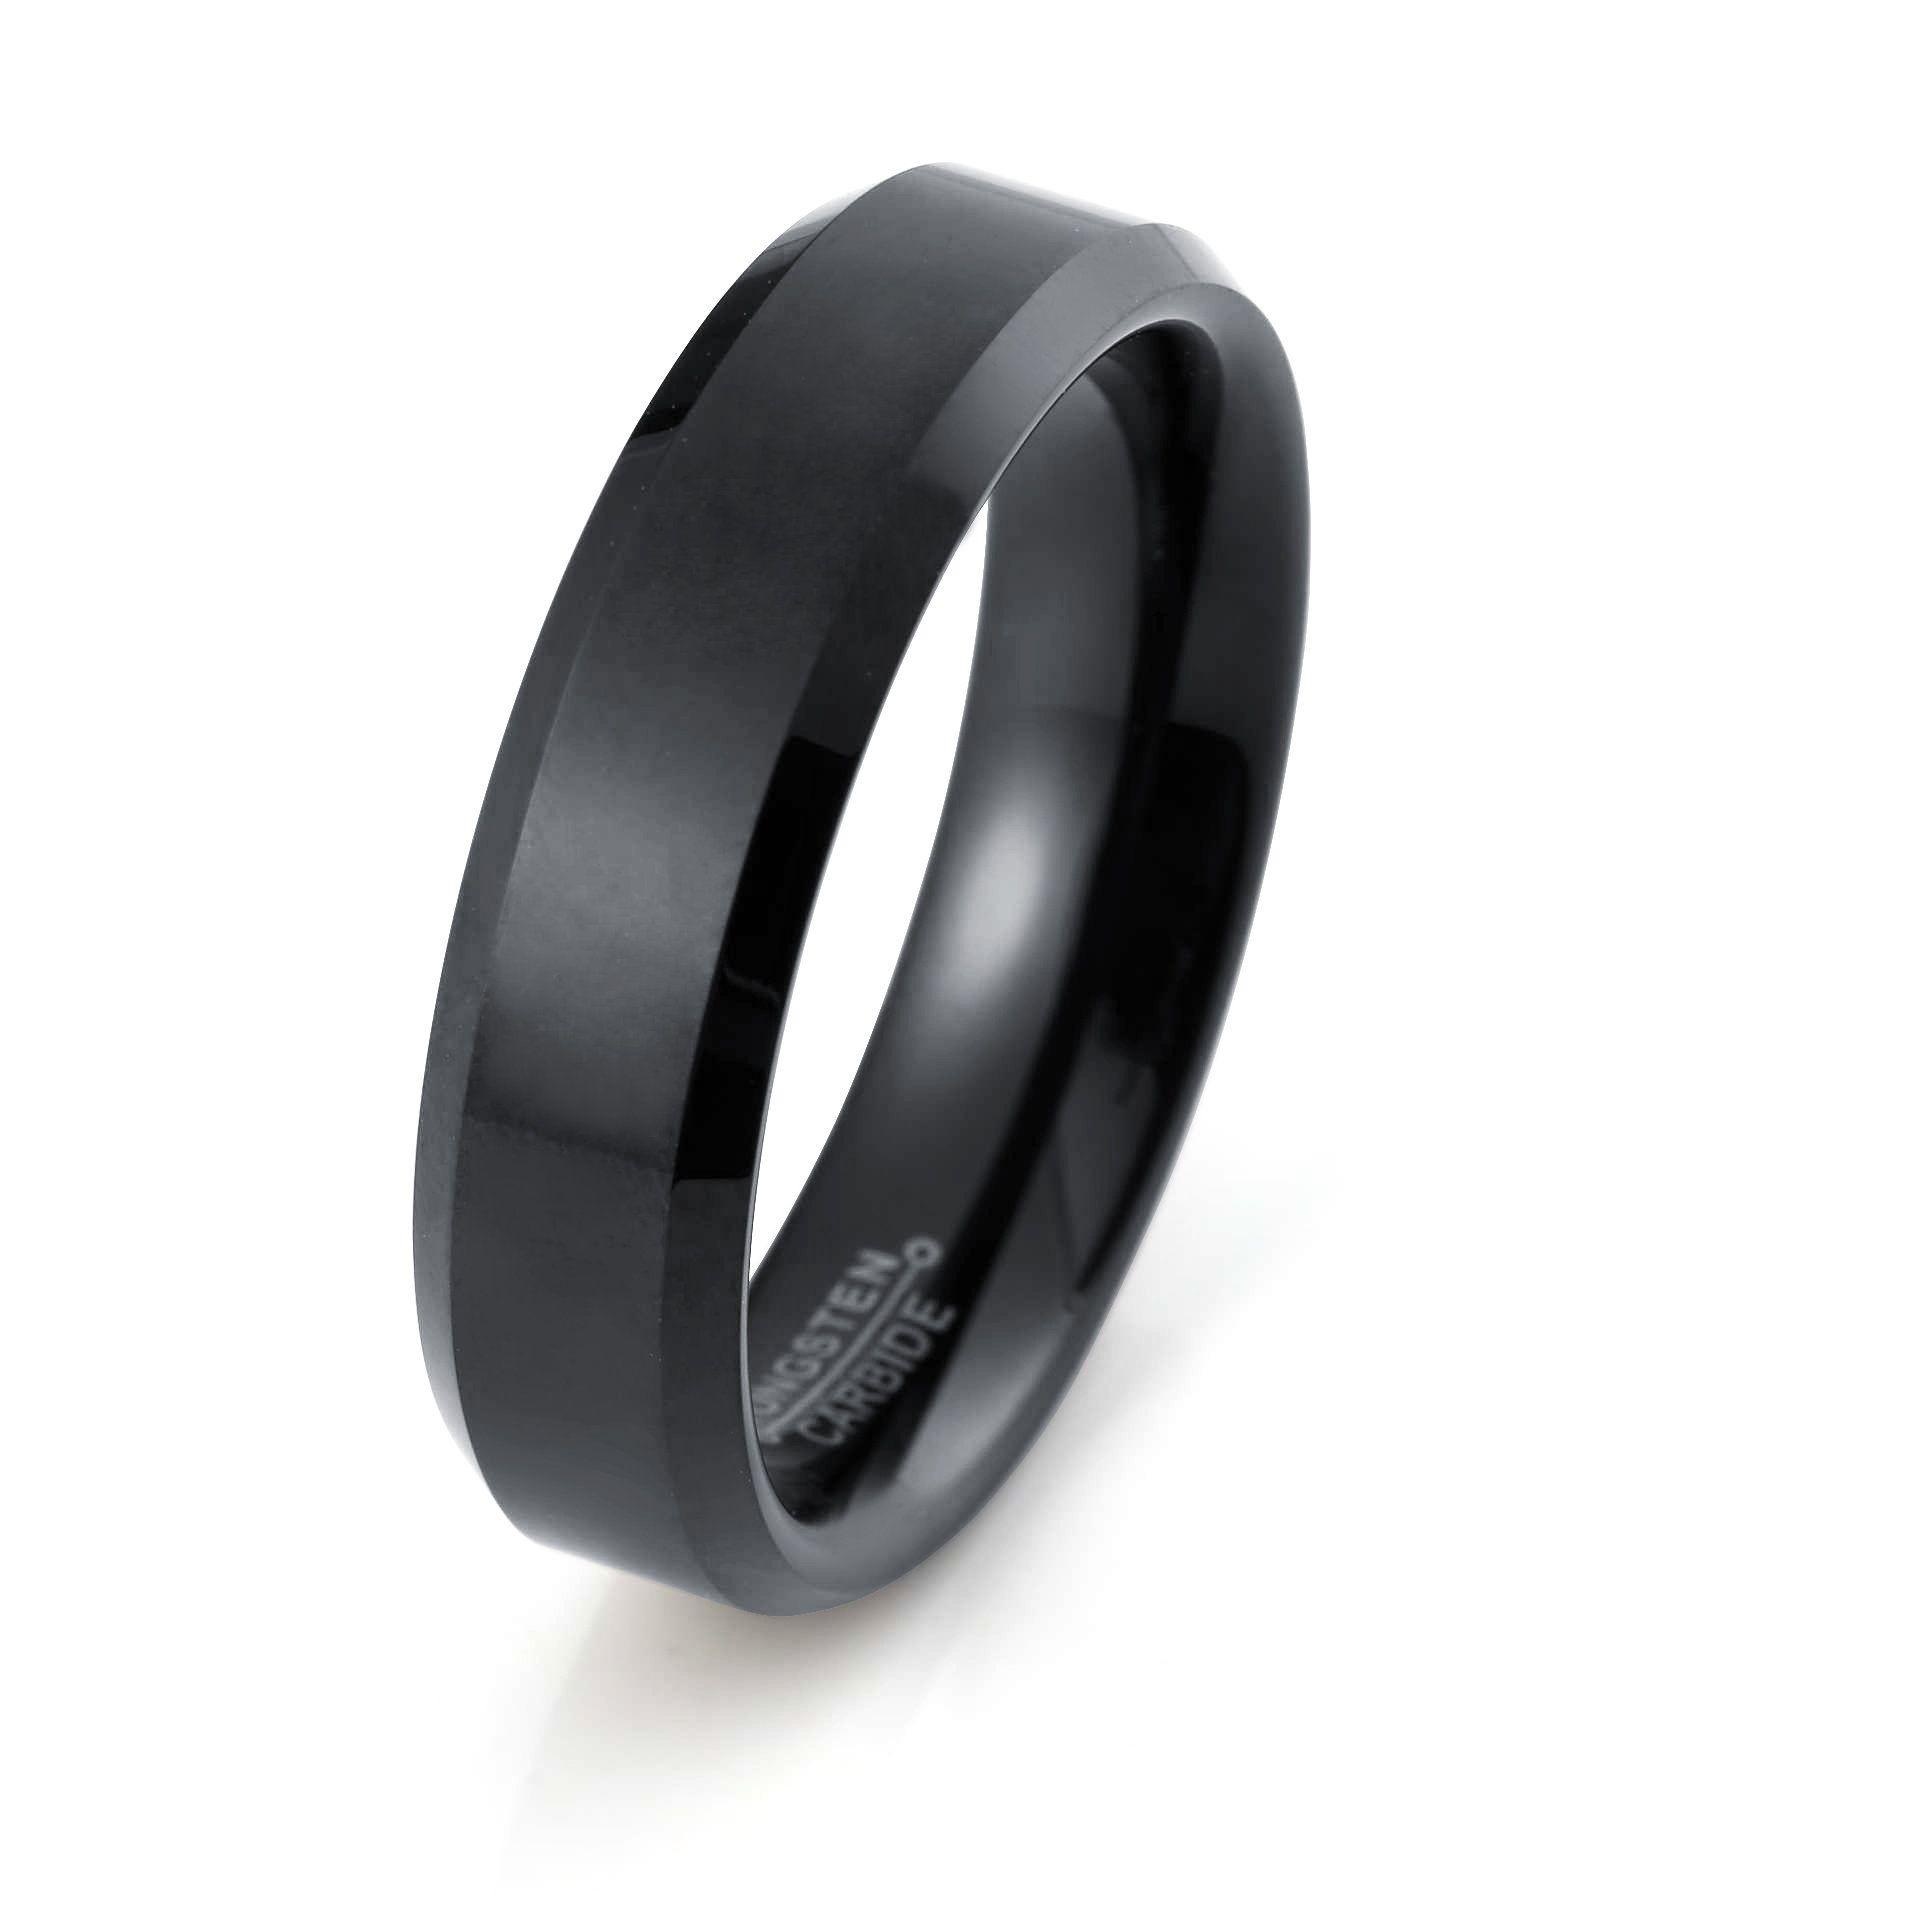 Black Tungsten Ring Polished Black Wedding Band 6mm Tungsten Etsy In 2020 Black Tungsten Rings Black Wedding Band Black Tungsten Wedding Band